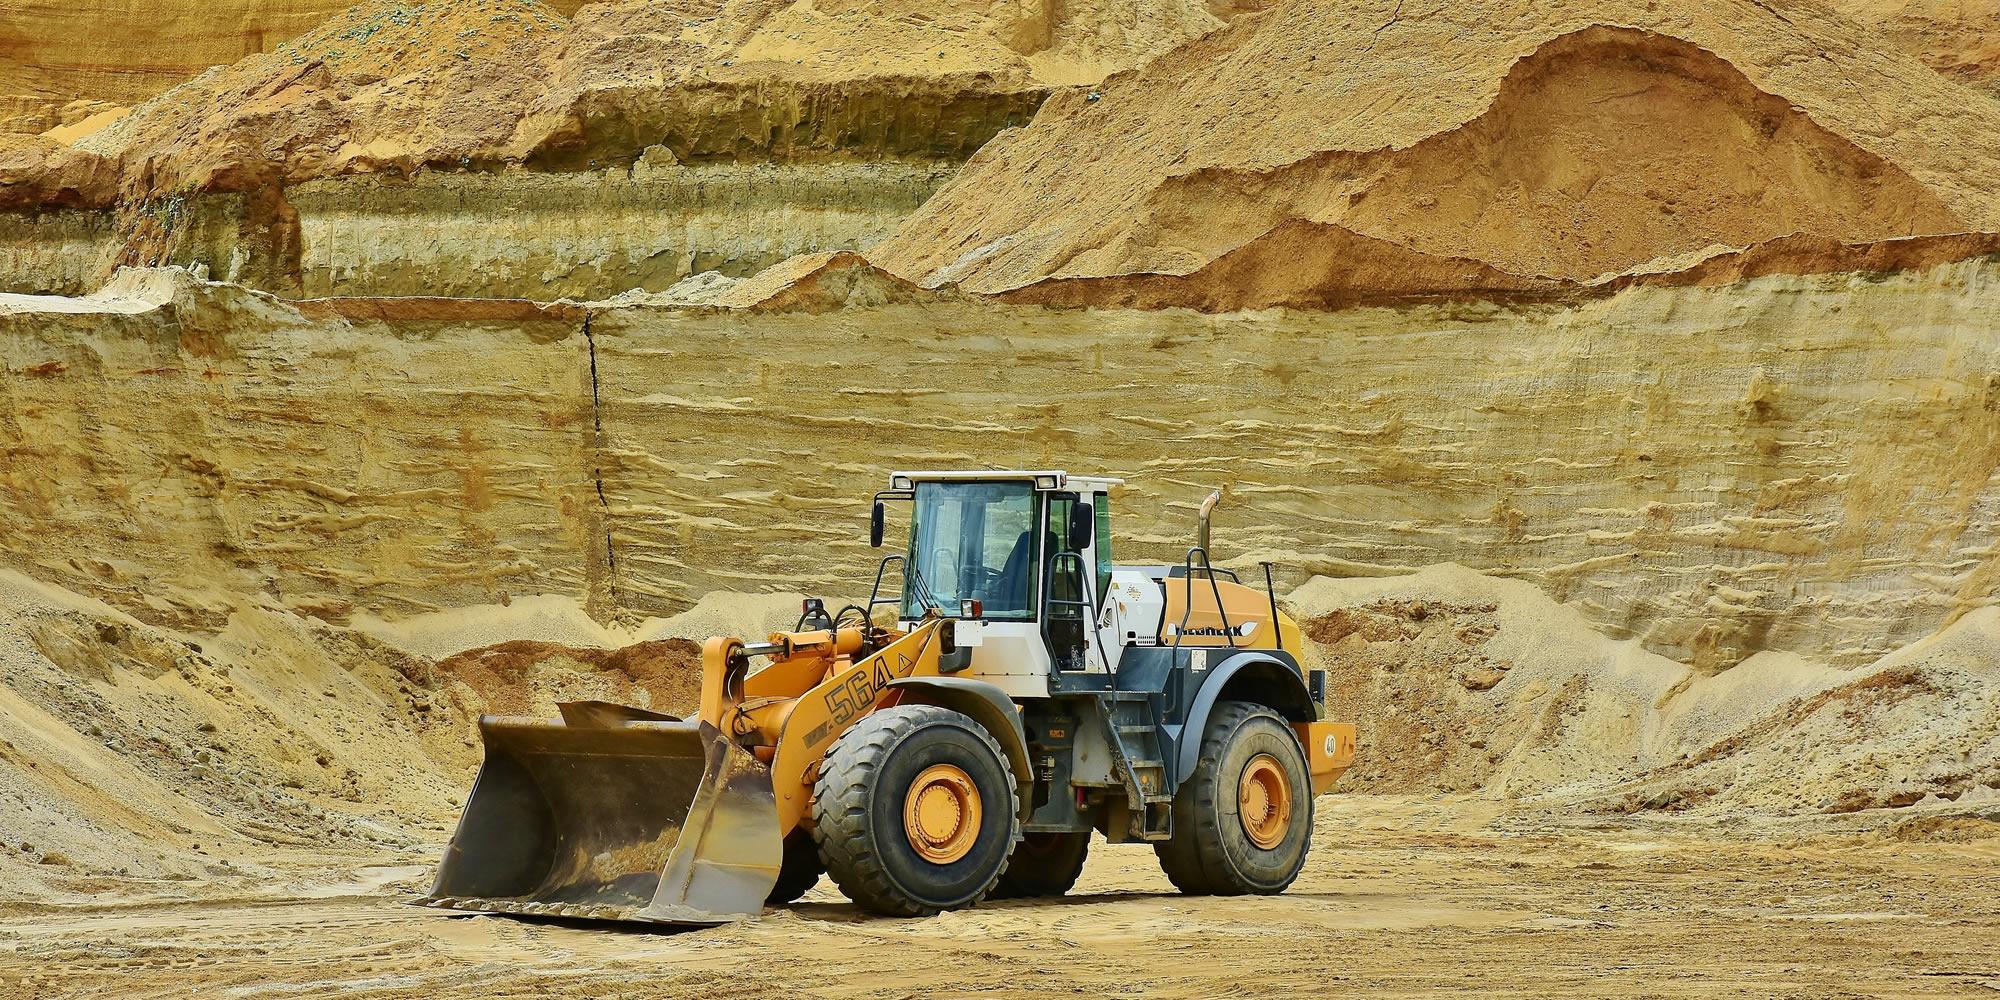 20181202-HC-Mining-African-Entrepreneur.jpg